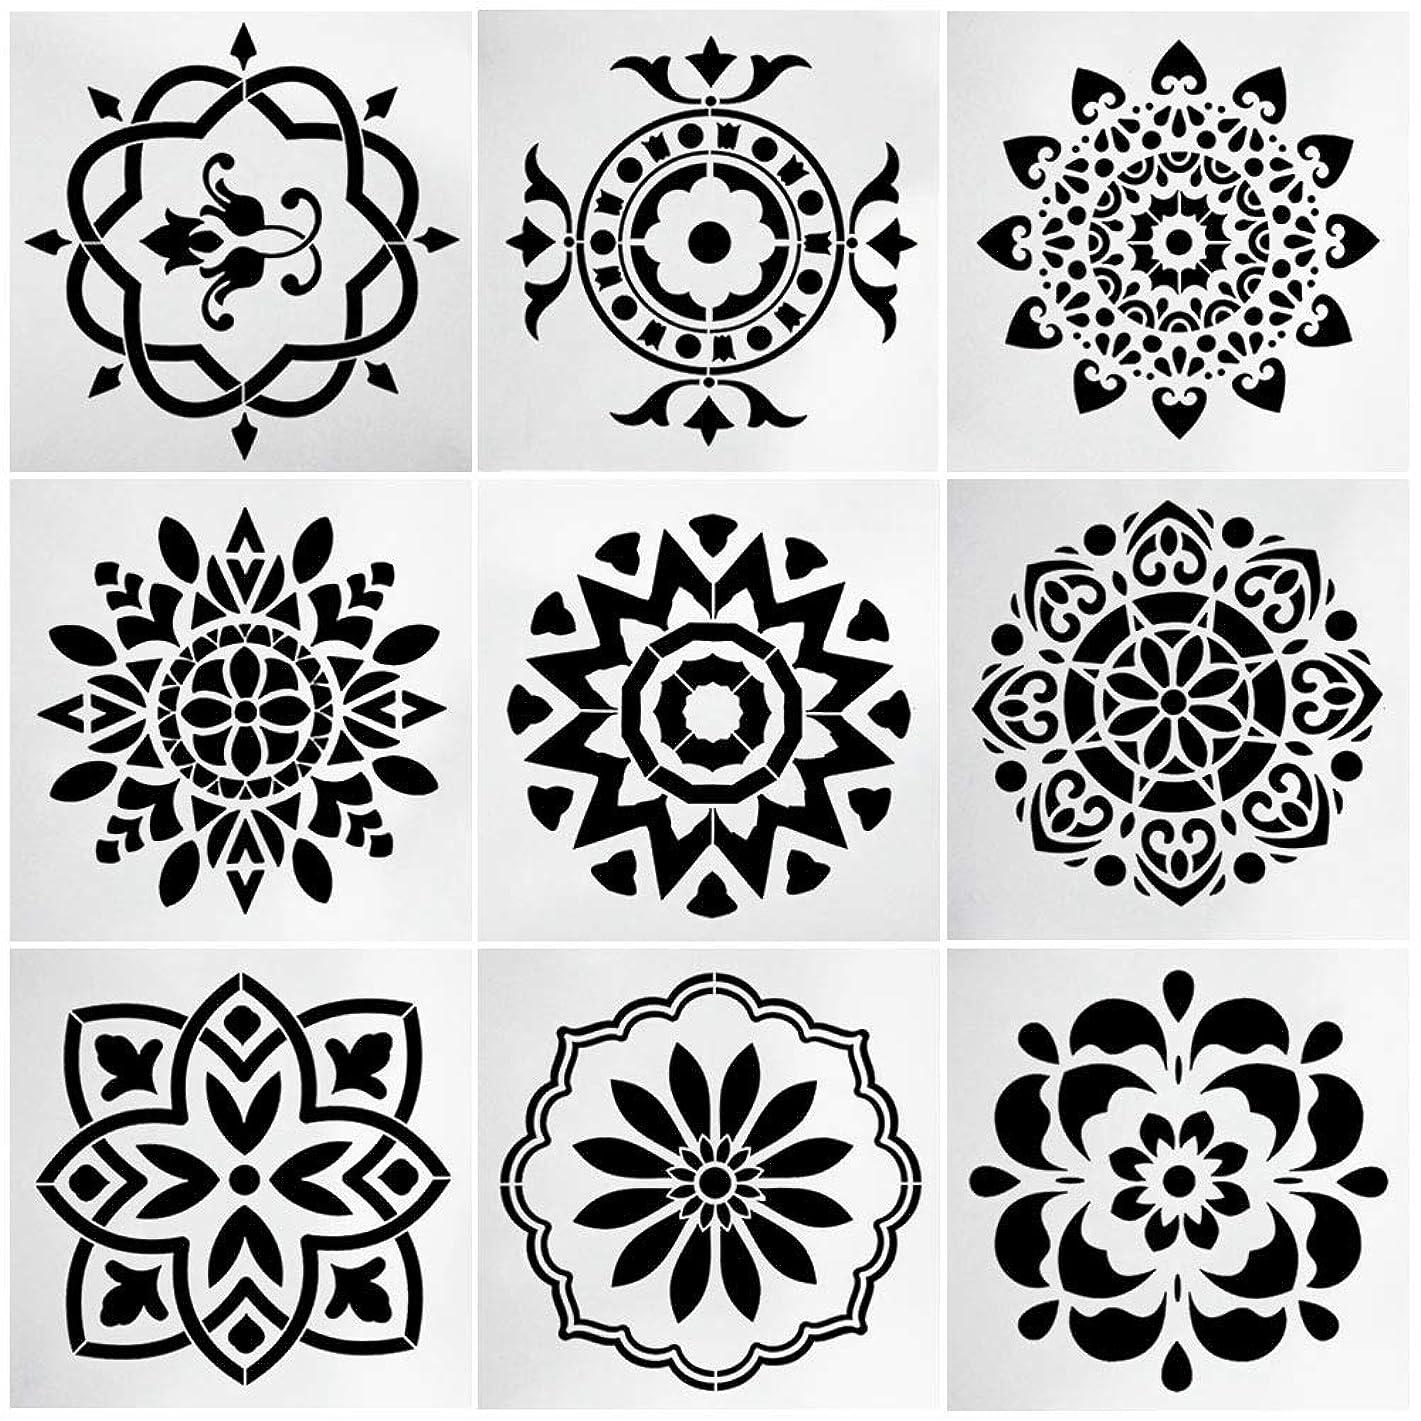 9pcs Stencils Set Tile Stencil, Uspacific 6x6 Inch PET Material Tile Paint Stencils for Laser Cut Painting, Walls, Fabric, Airbrush, Furniture, Floor (1)